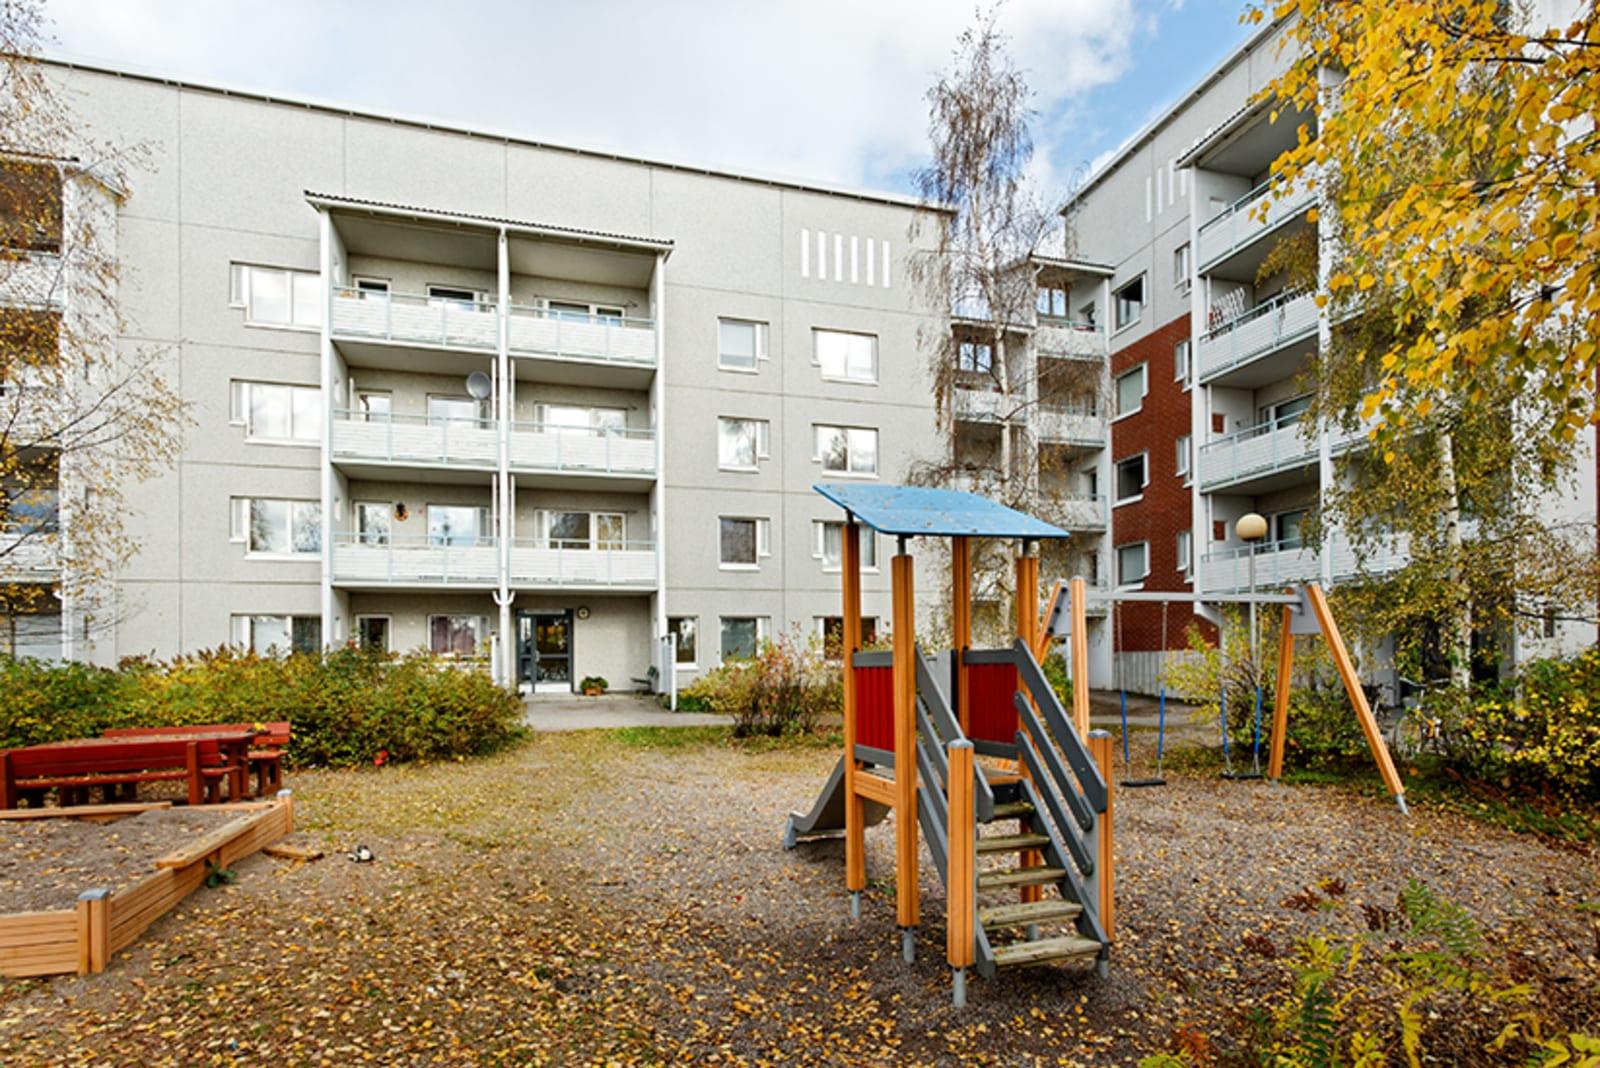 Lahti, Asemantausta, Nuolikatu 9